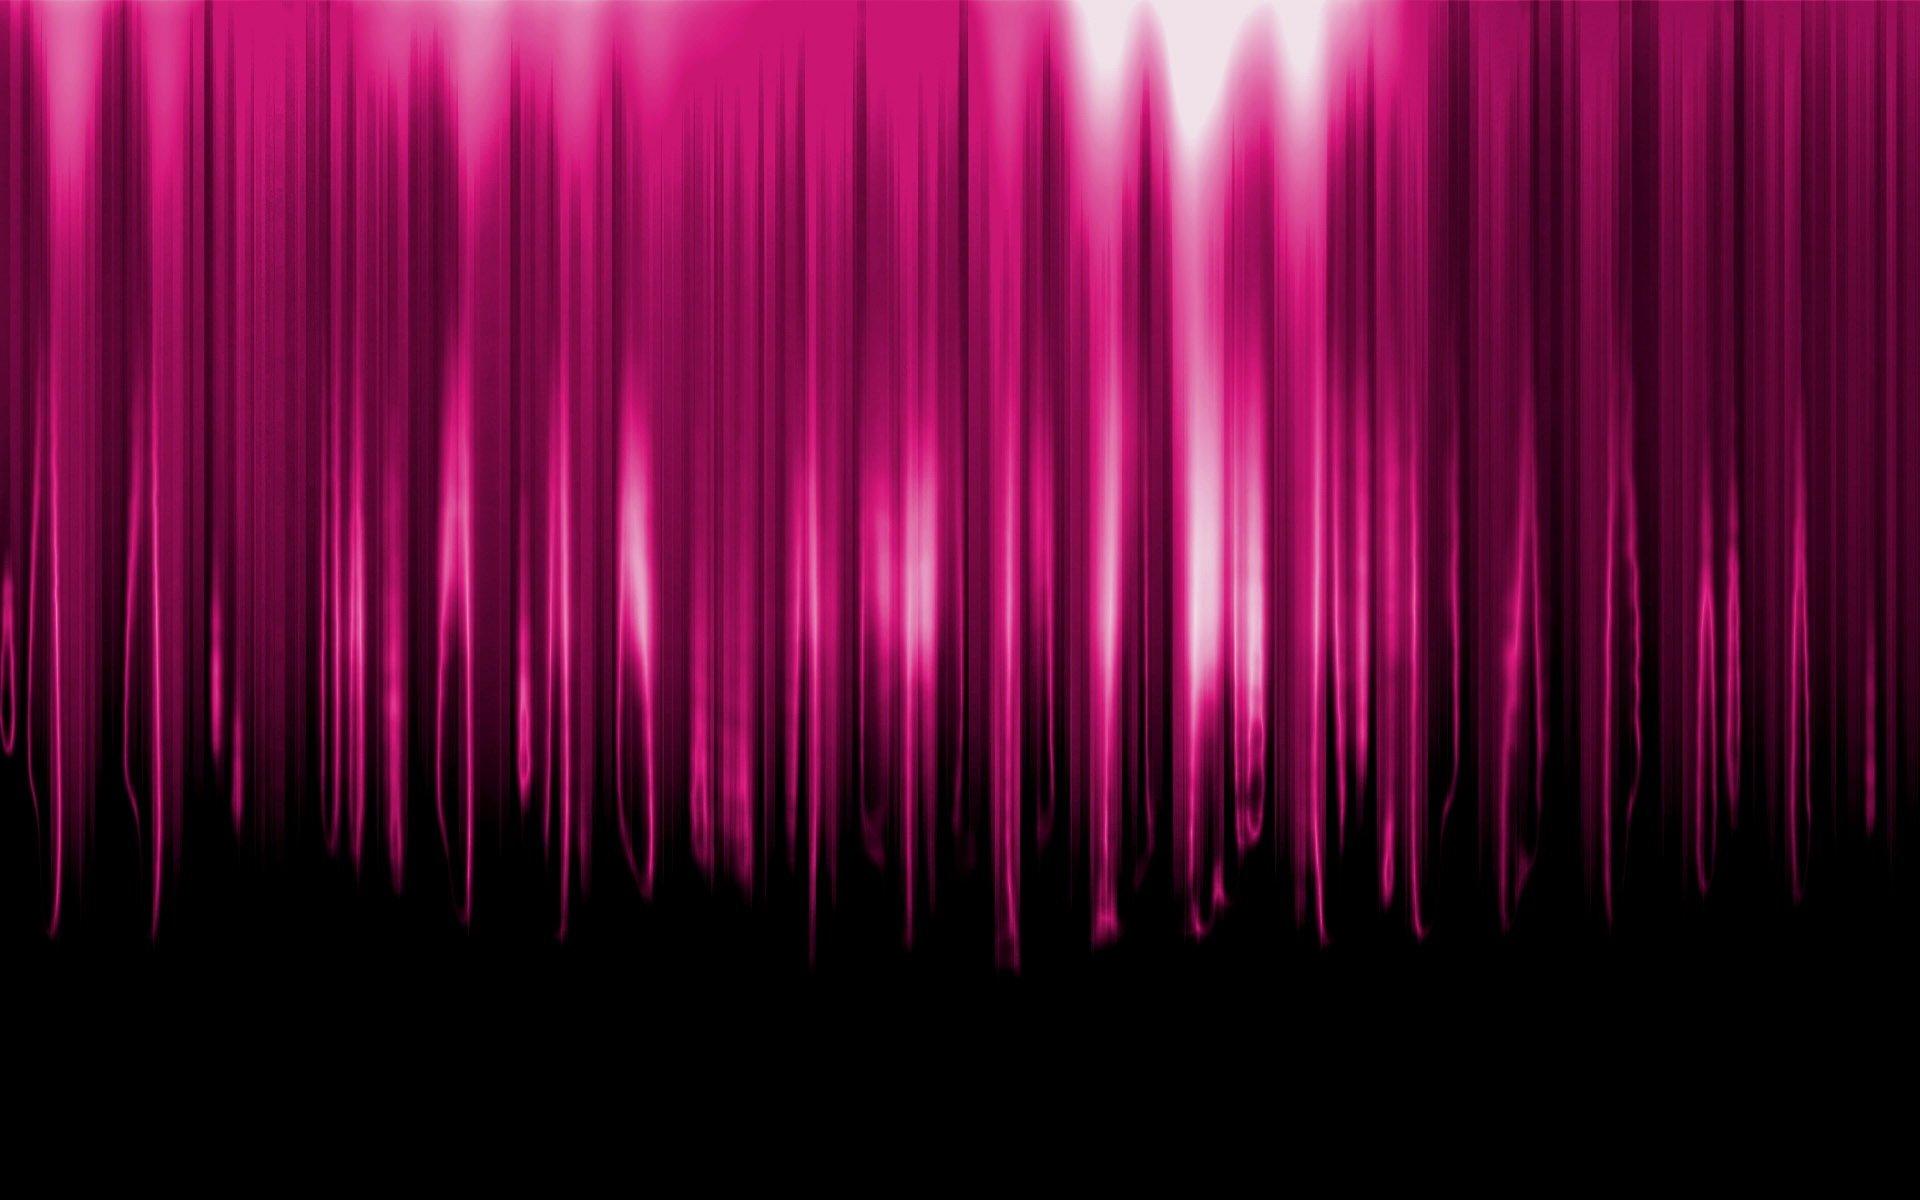 Pink Full HD Papel De Parede And Planos De Fundo